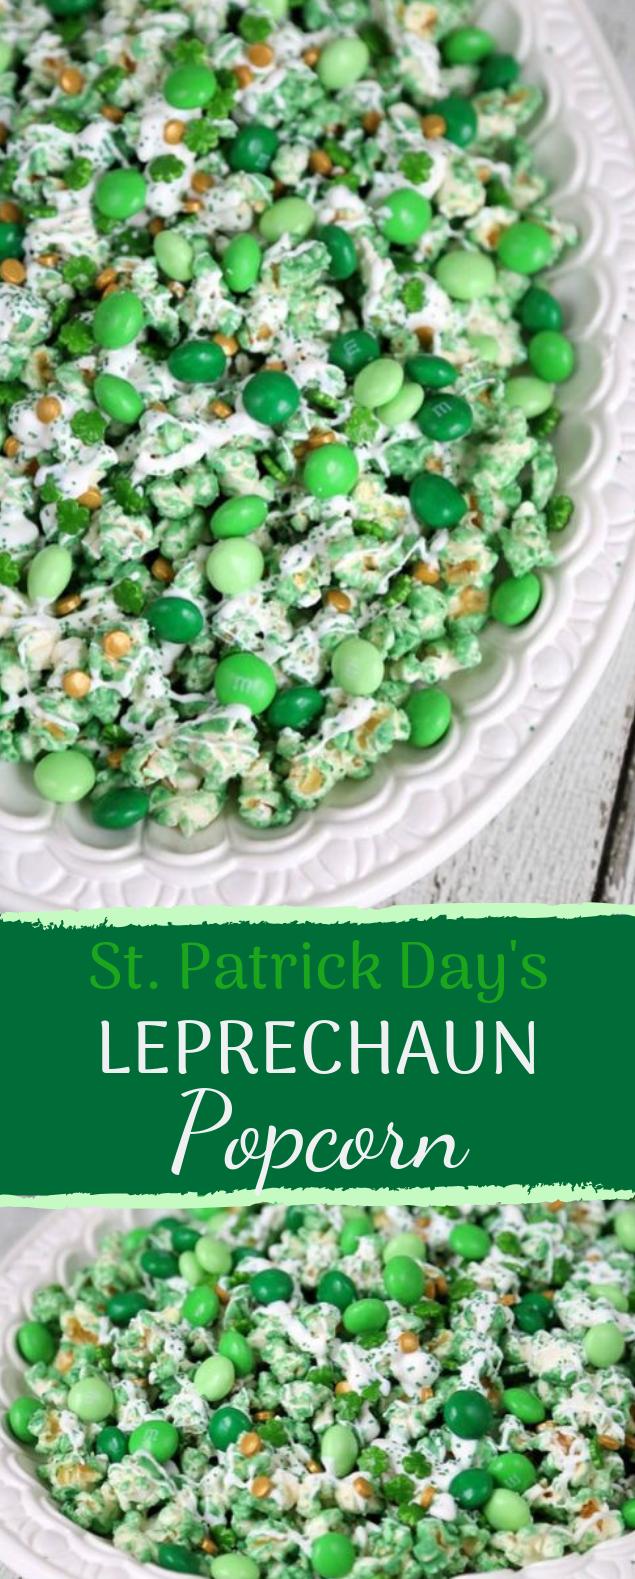 Leprechaun Popcorn #dessert #stpatrickday